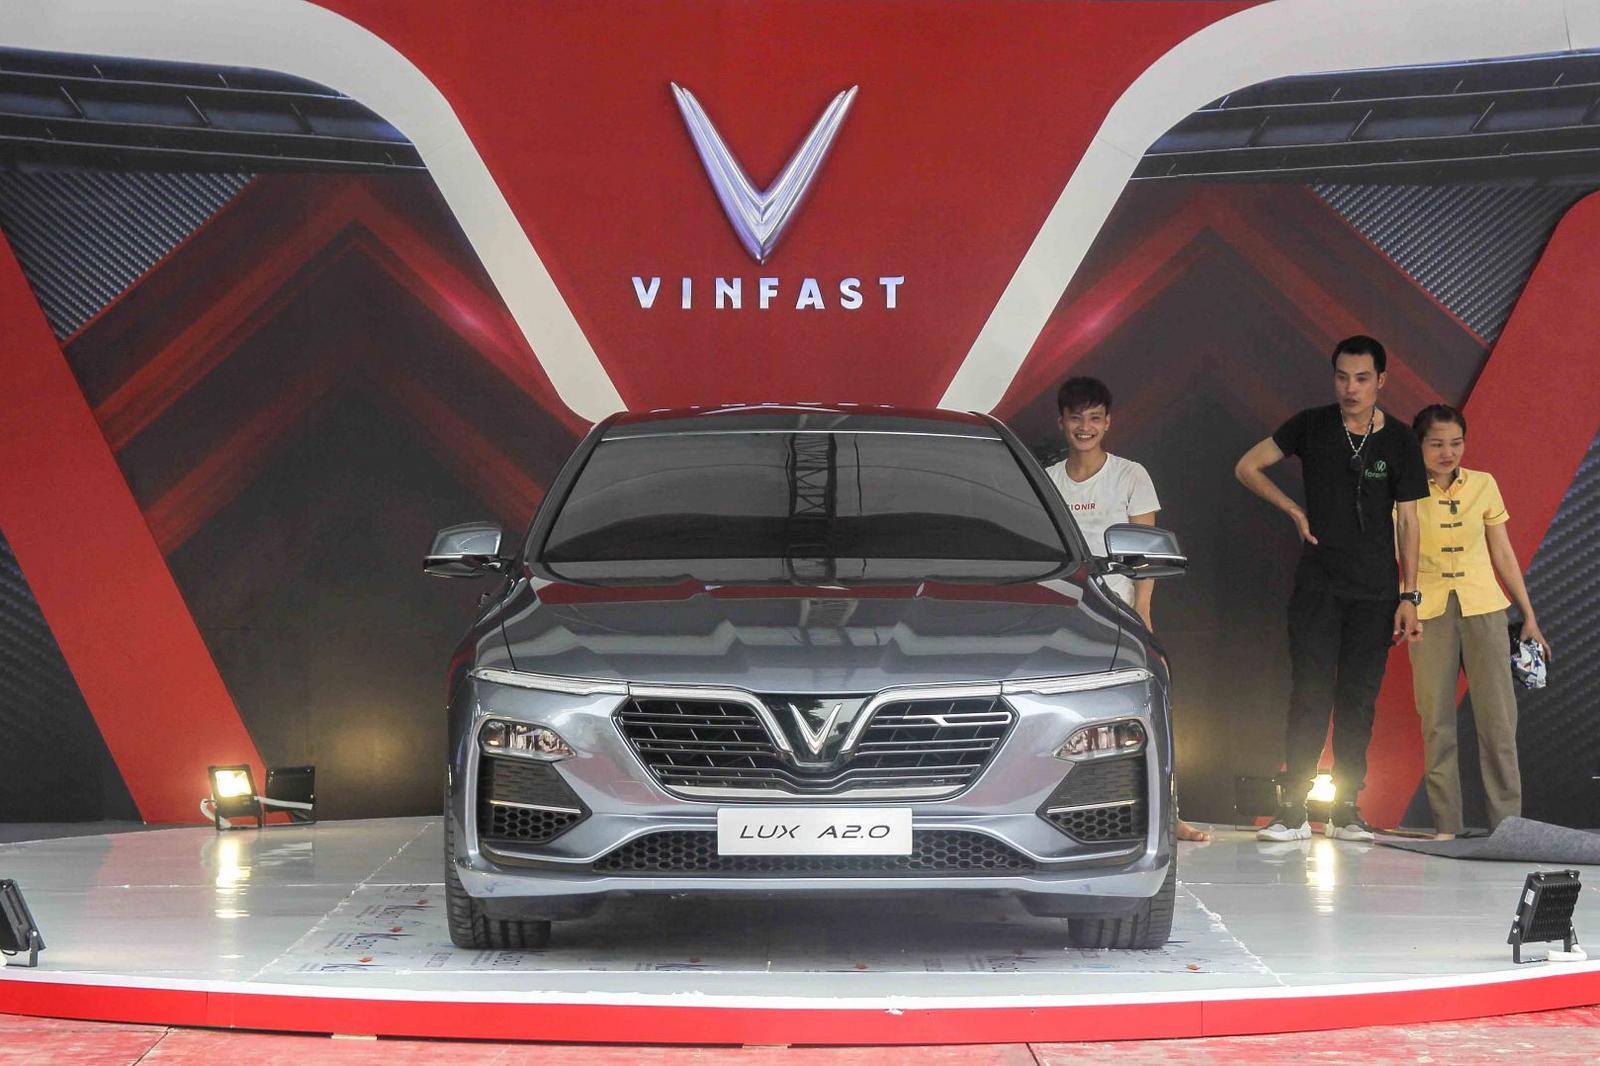 xe-vinfast-gop-mat-tai-trien-lam-ton-vinh-hang-viet-nam-1.jpg